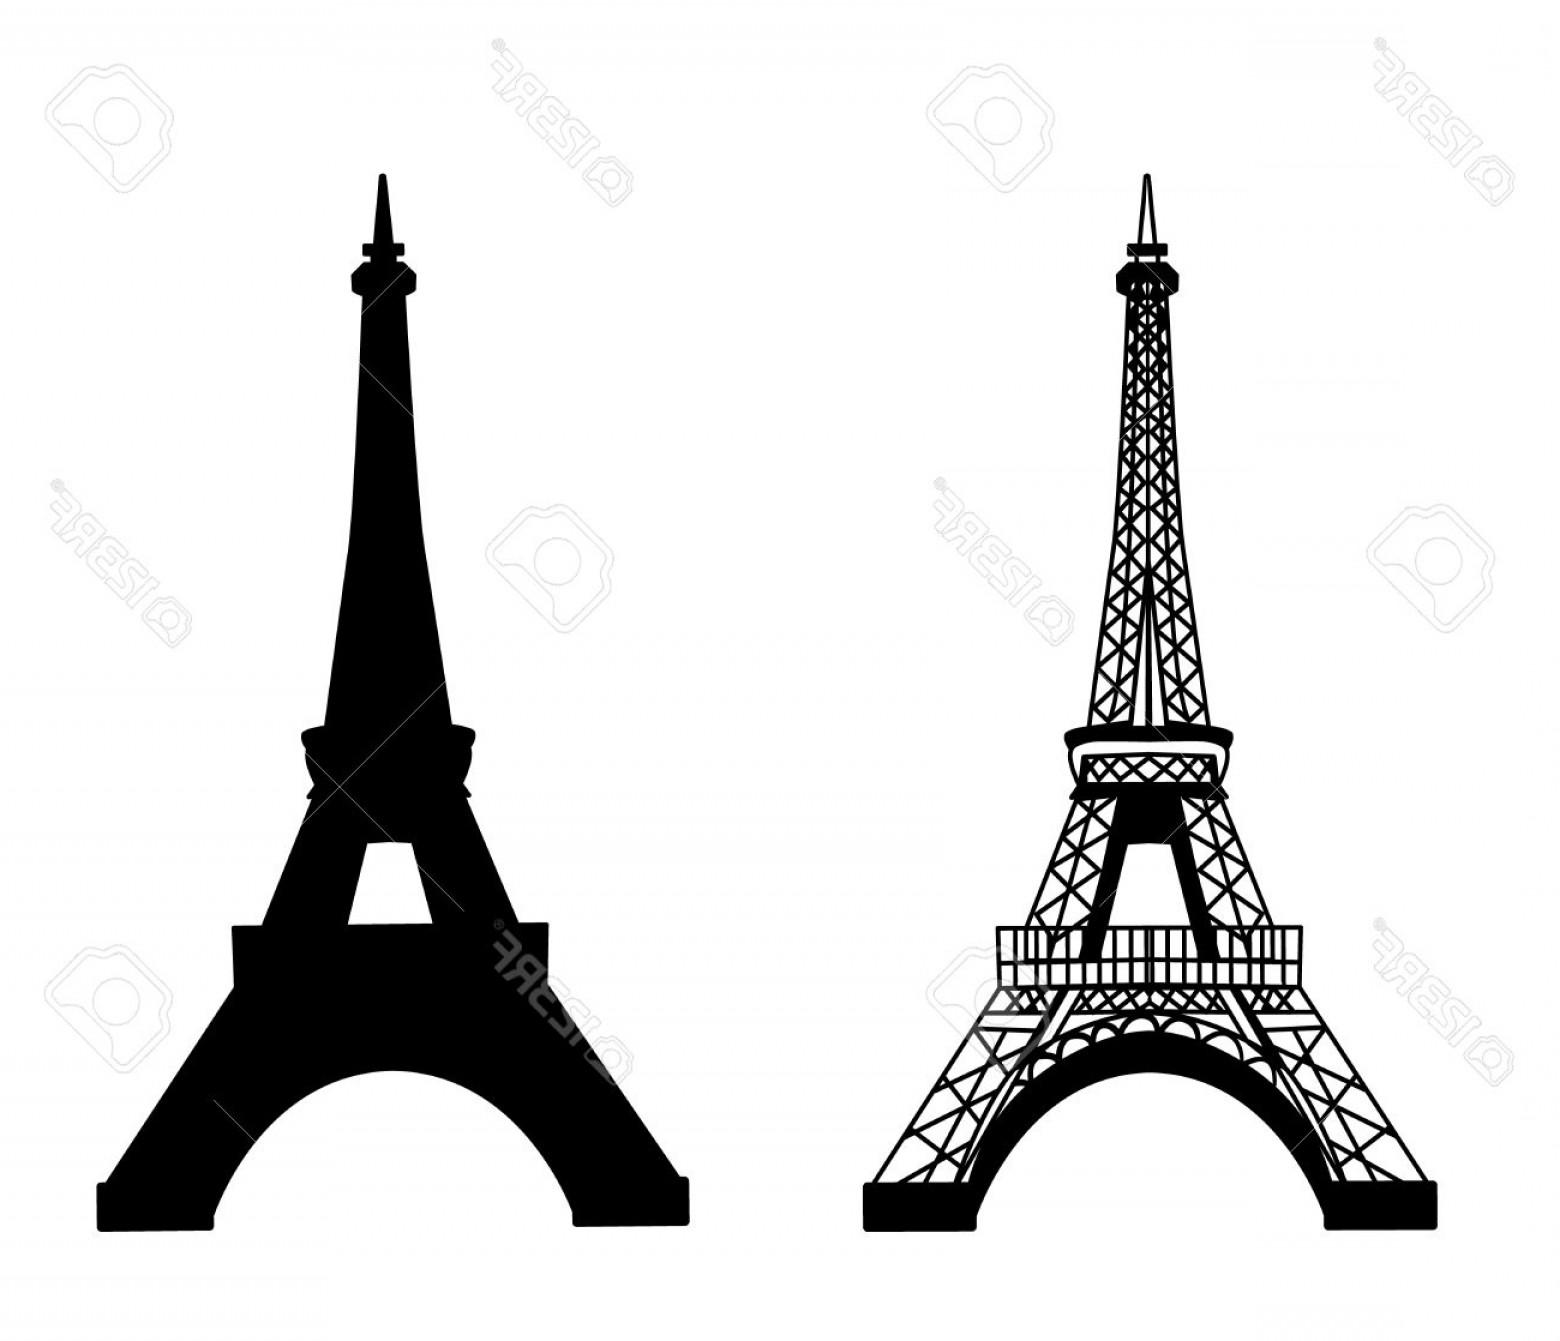 1560x1341 Photostock Vector Eiffel Tower Isolated Vector Illustration Black